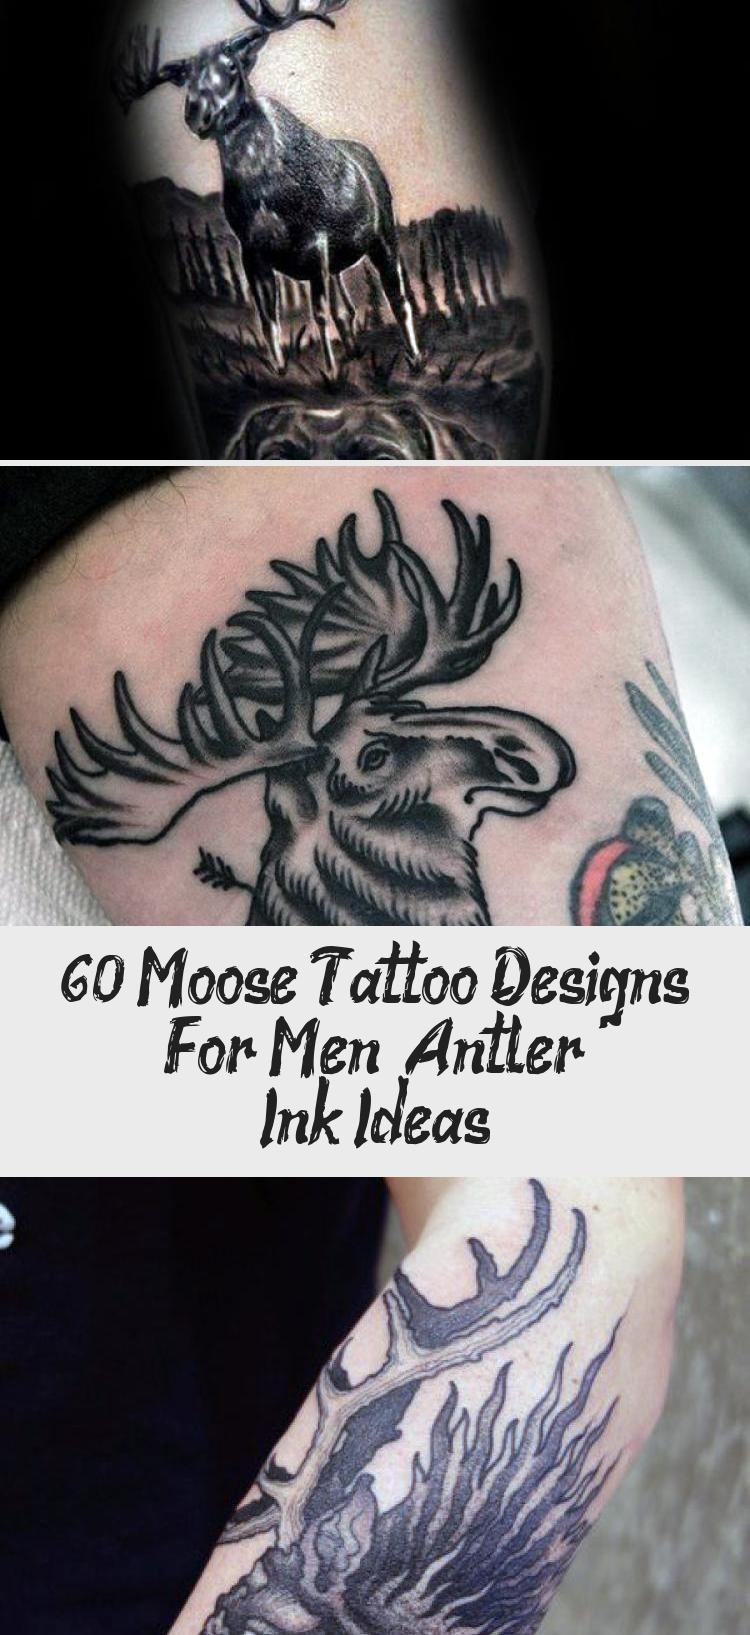 Moose Antler Tattoo : moose, antler, tattoo, Moose, Tattoo, Designs, Antler, Ideas, Tattoos, Tattoo,